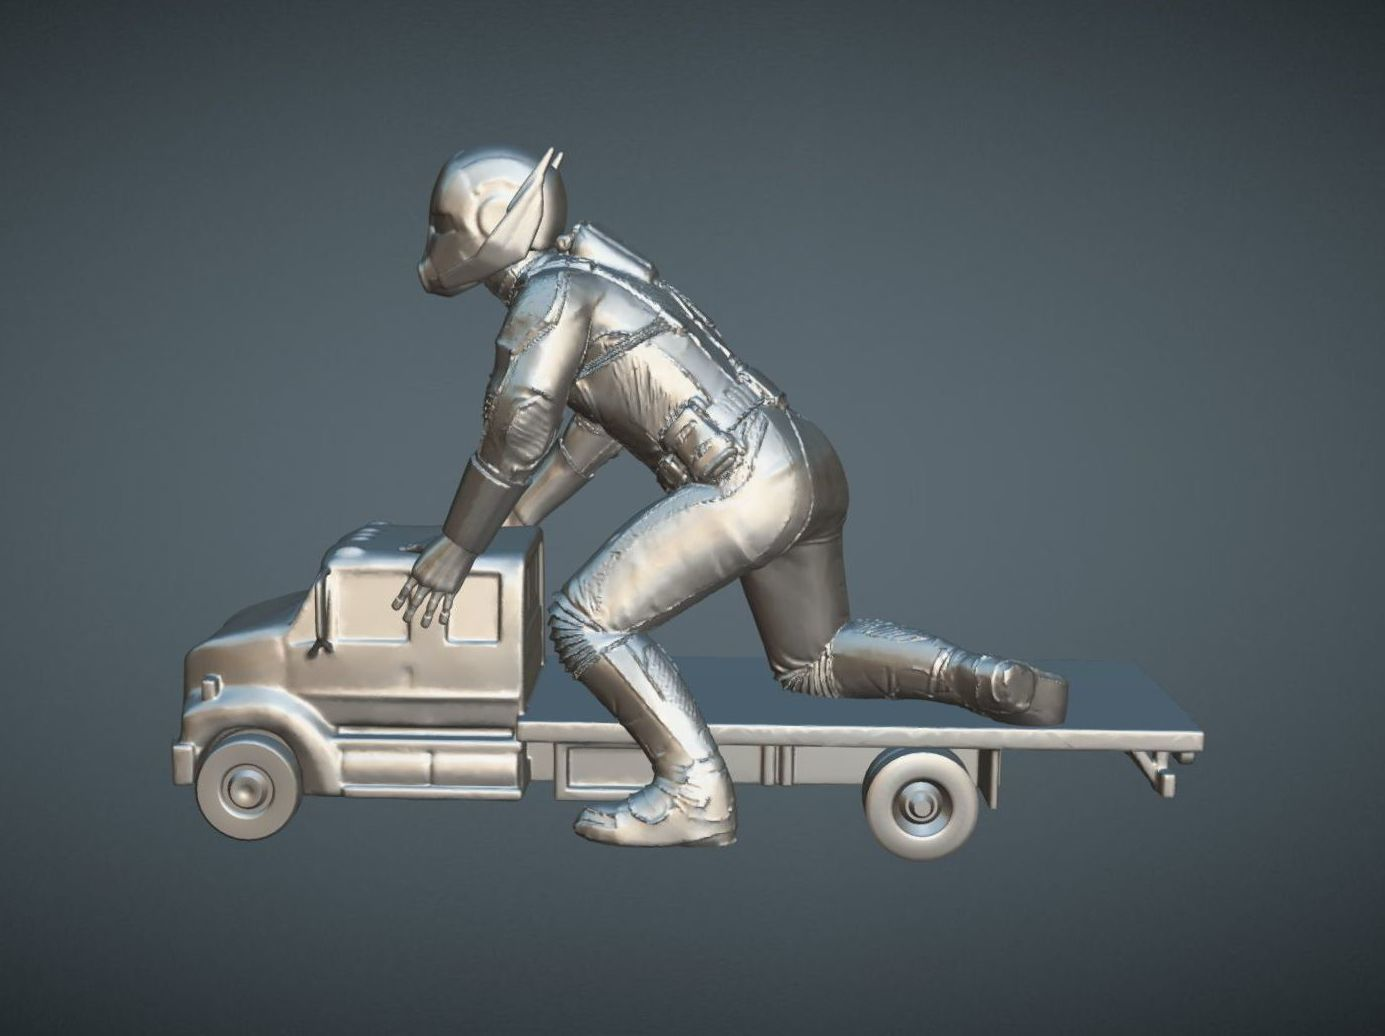 capture_05072018_175038.jpg Download OBJ file ANT-MAN 2 INSPIRITED MODEL • 3D print template, Masterclip